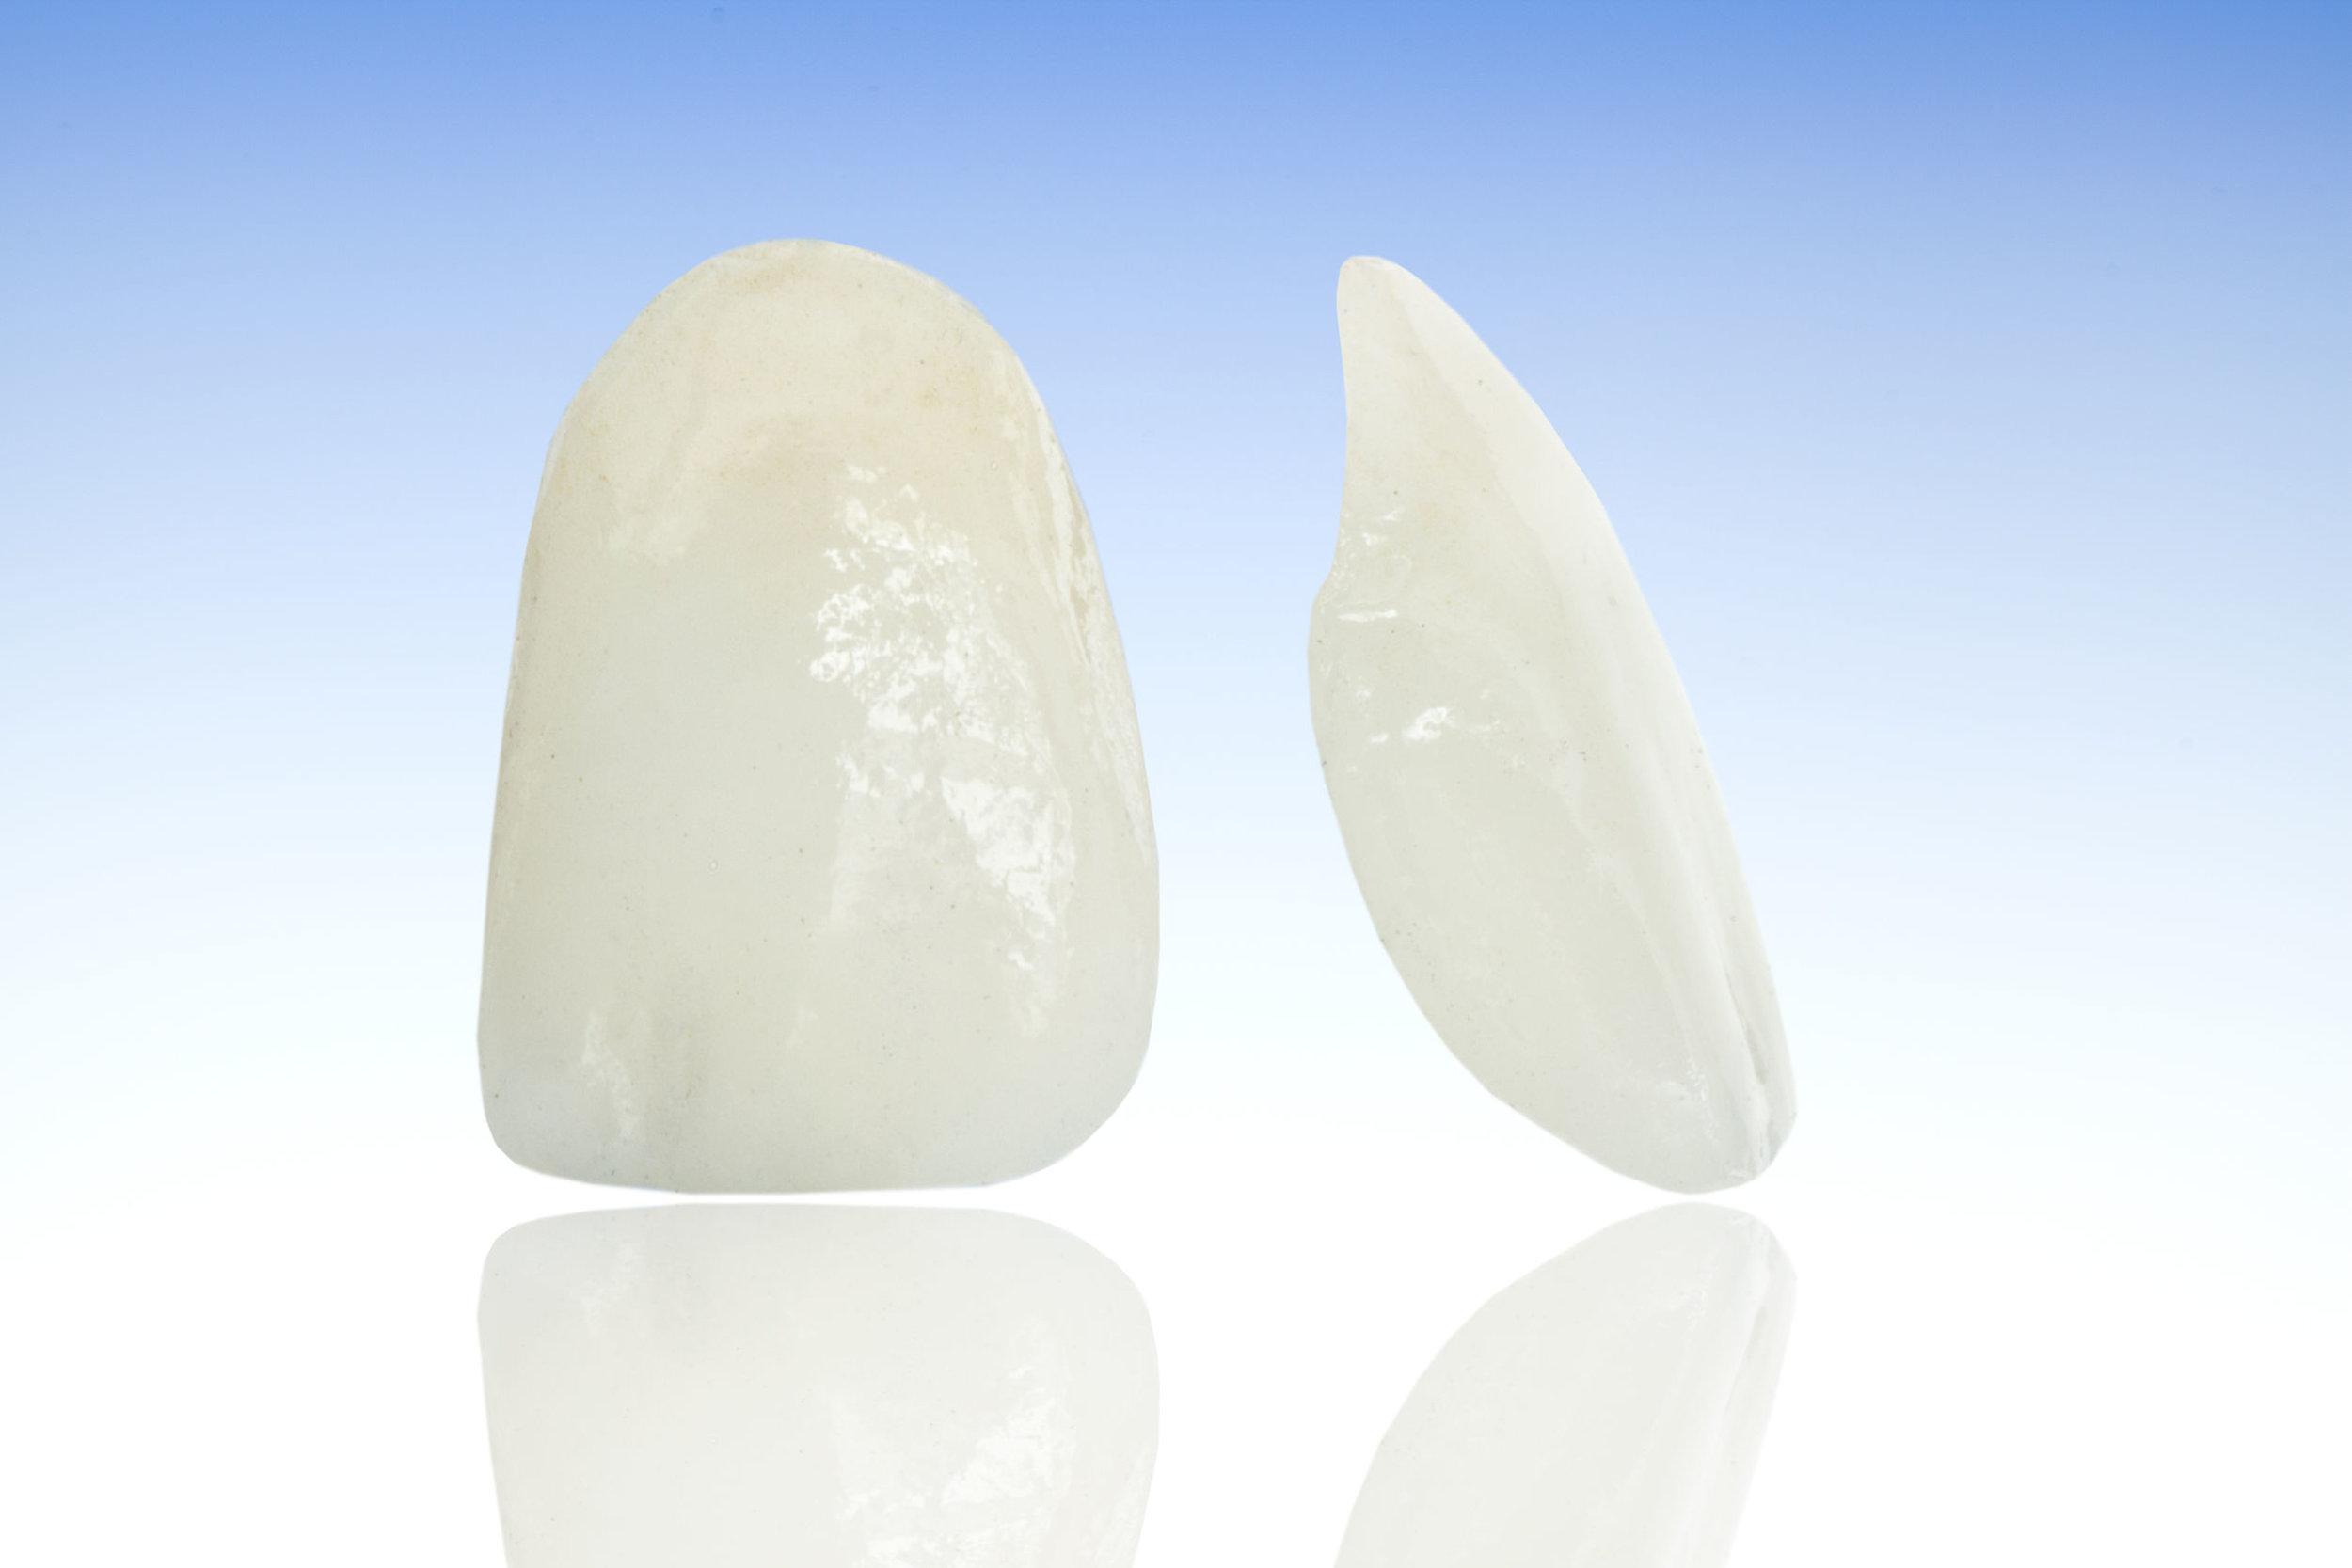 Porcelain Veneers with Eastlake Center for Implants and Restorative Dentistry